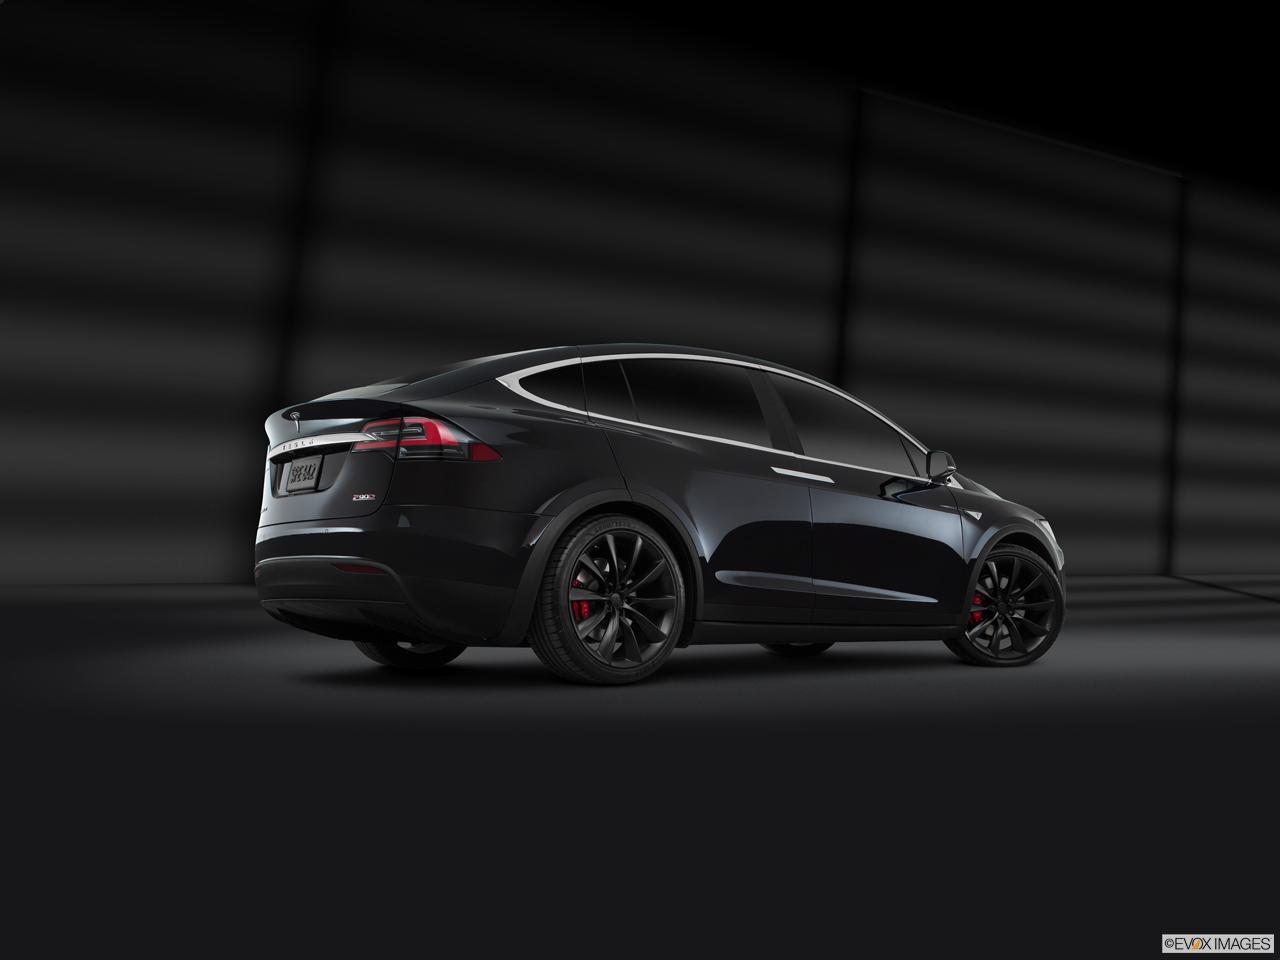 Tesla Model X 2018 75D in UAE: New Car Prices, Specs ...